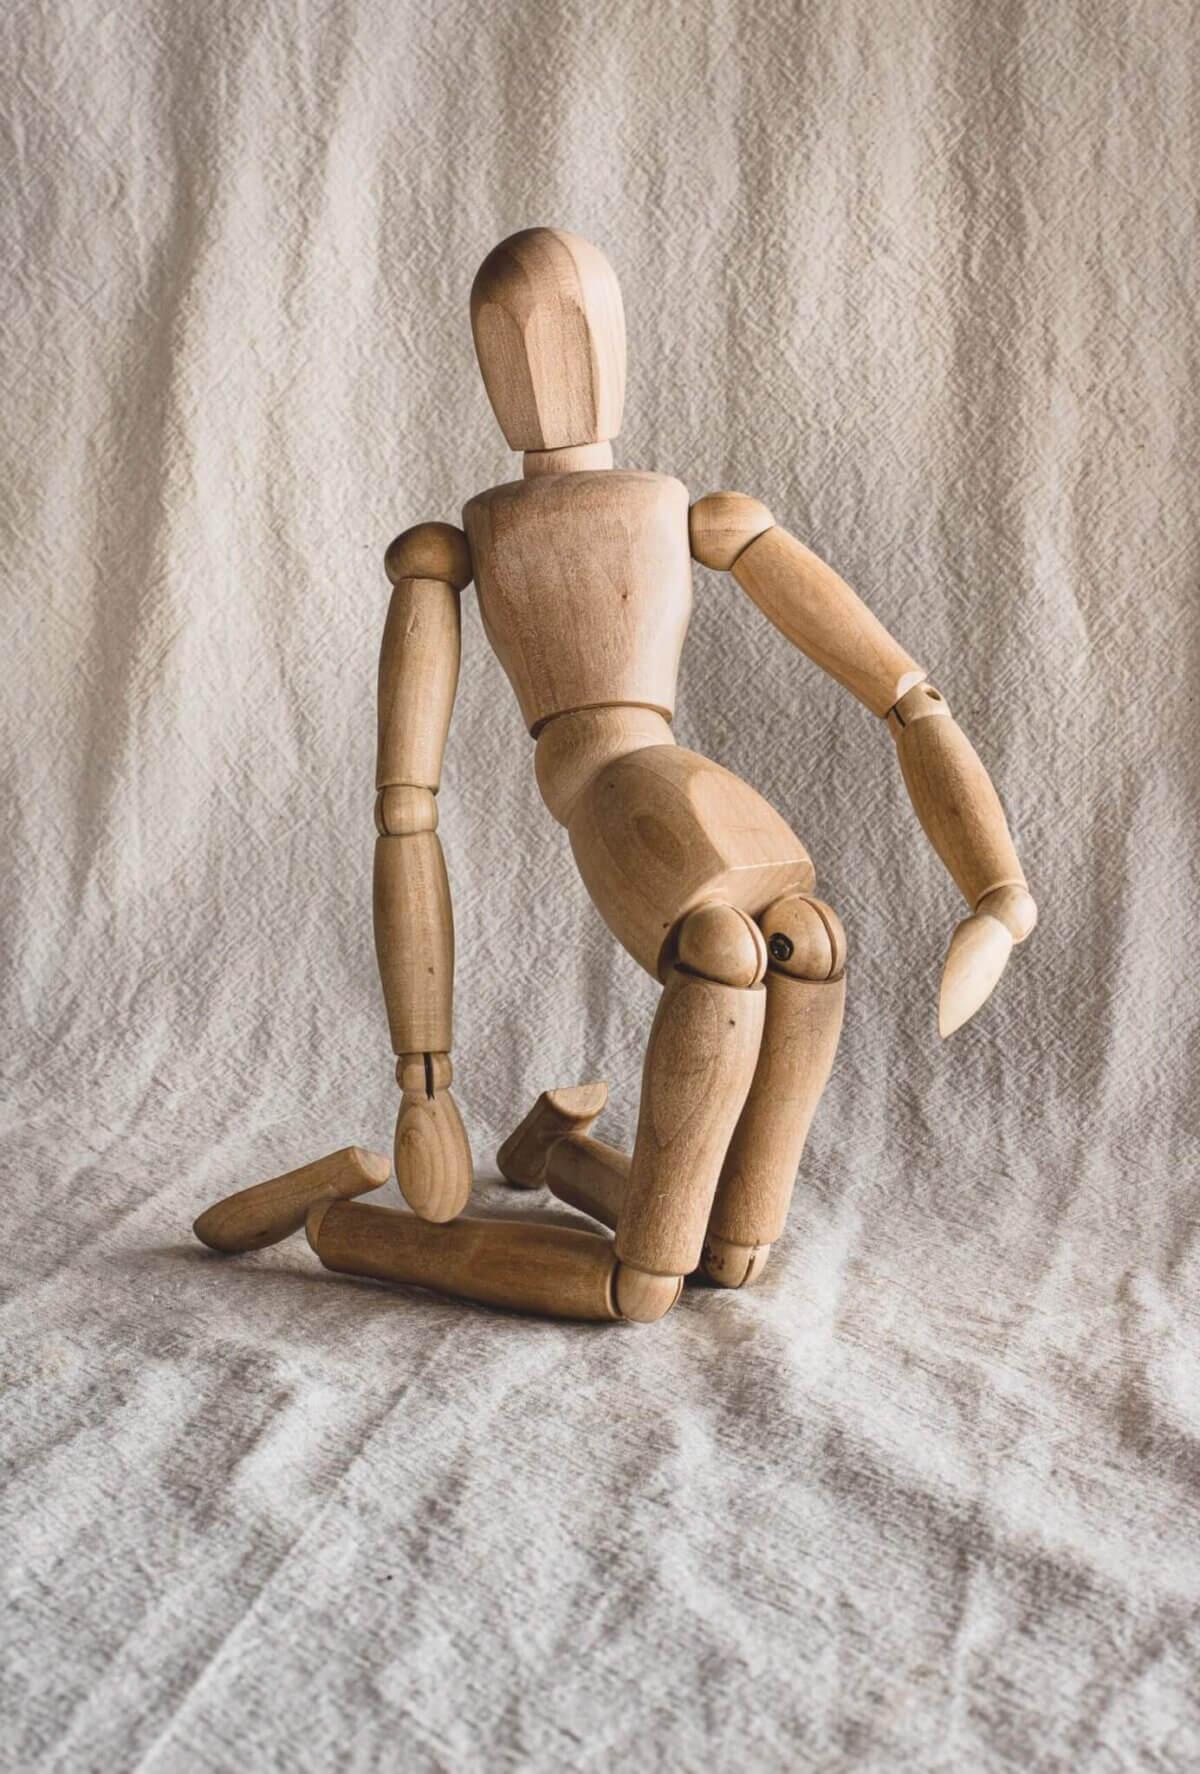 brown wooden human figure